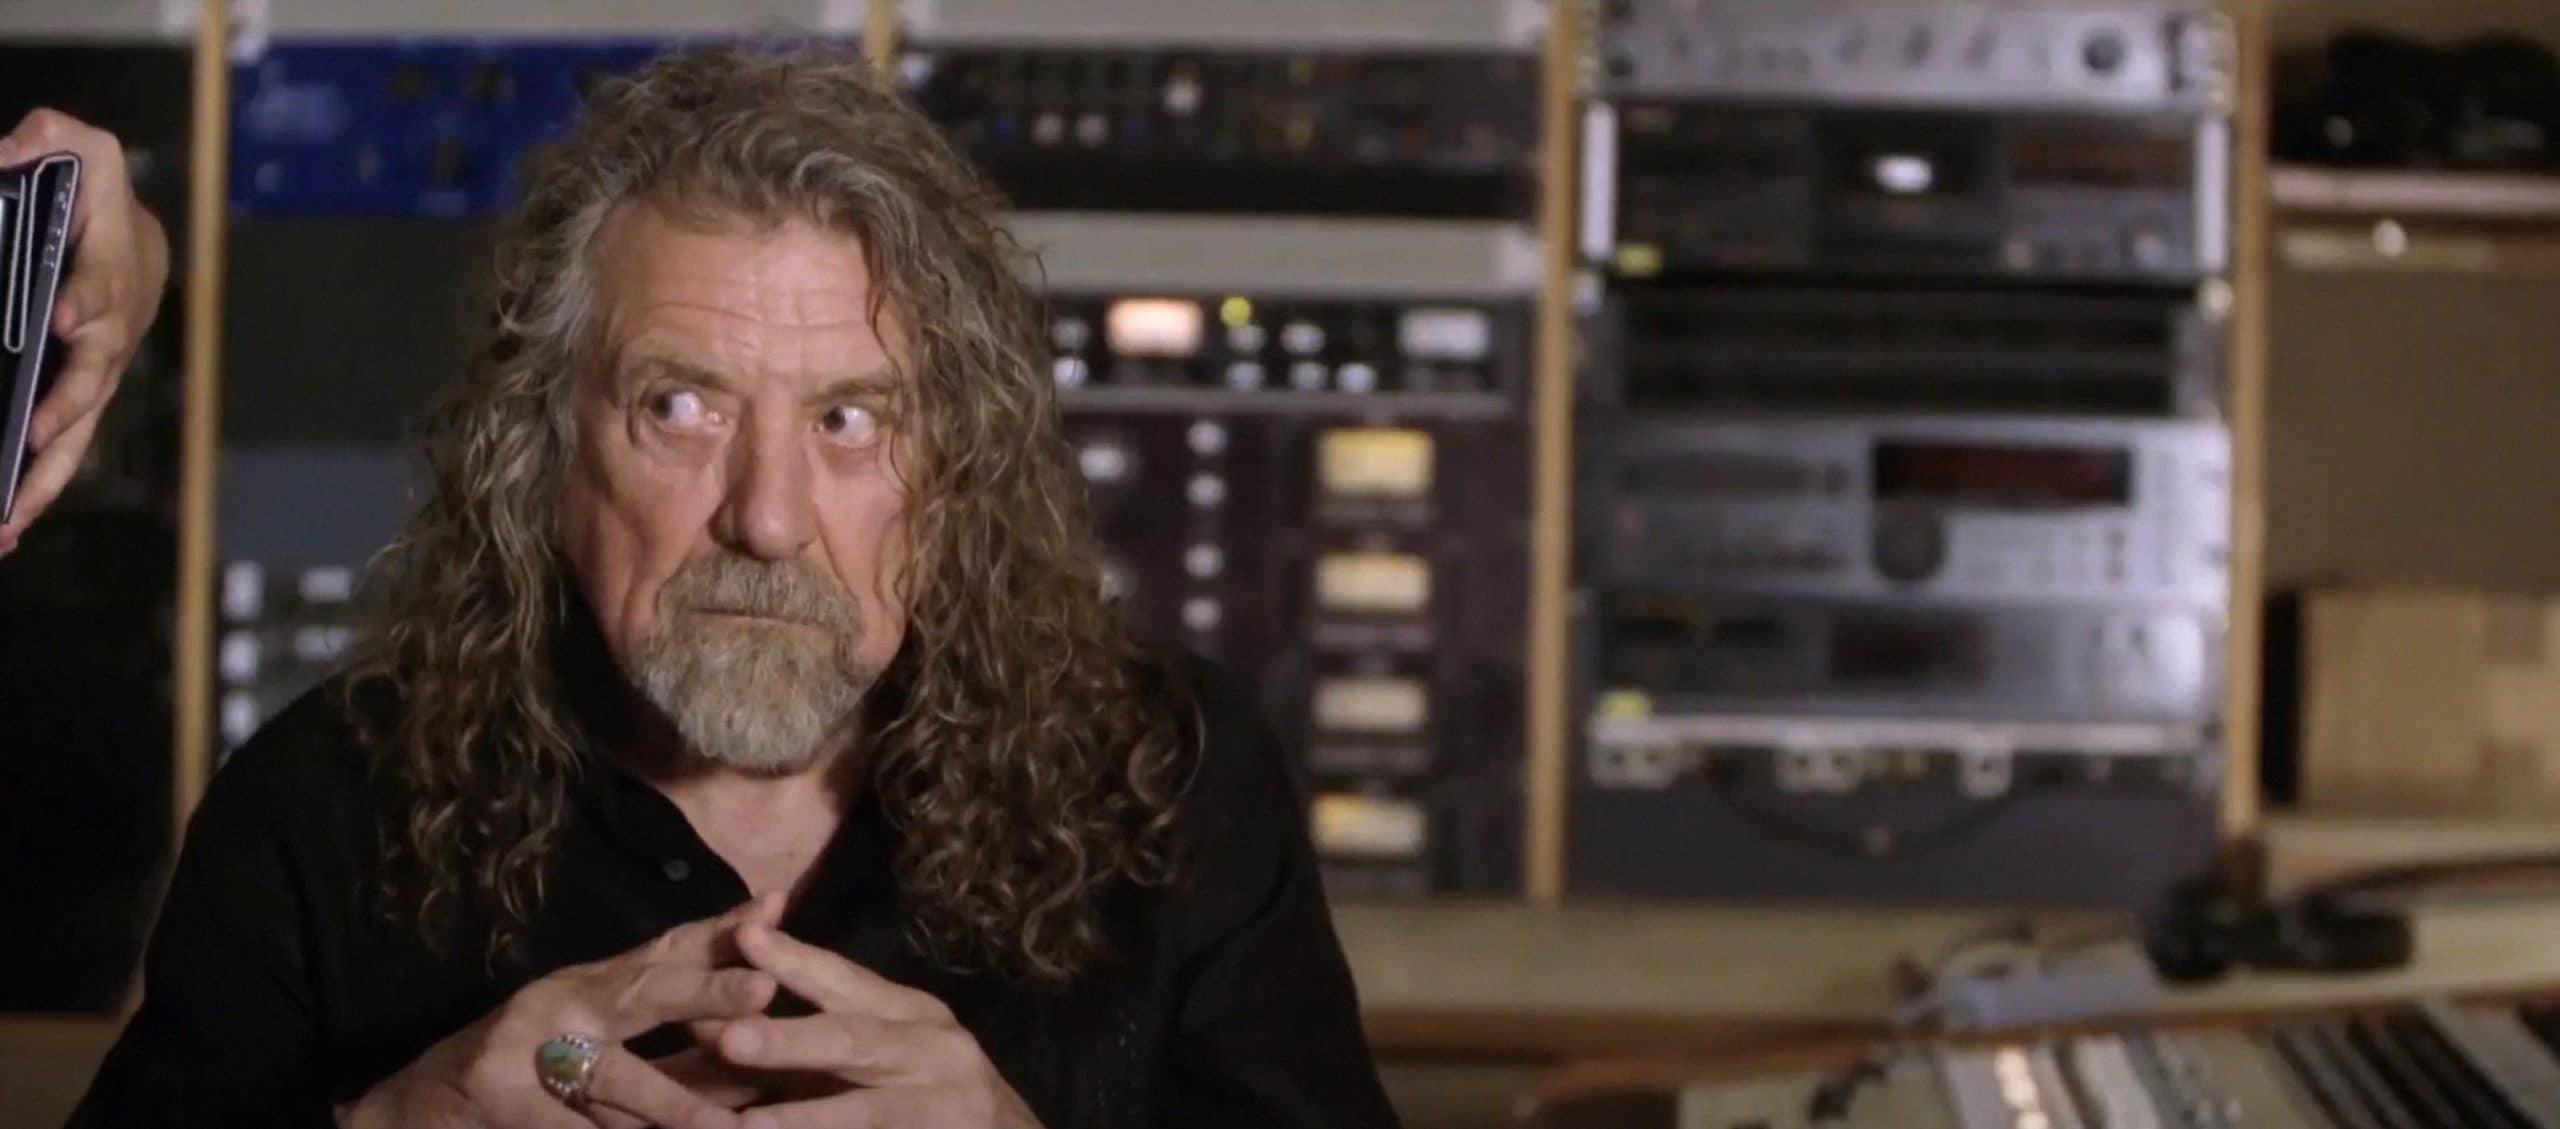 ROCKFIELD: THE STUDIO ON THE FARM, Robert Plant, 2020